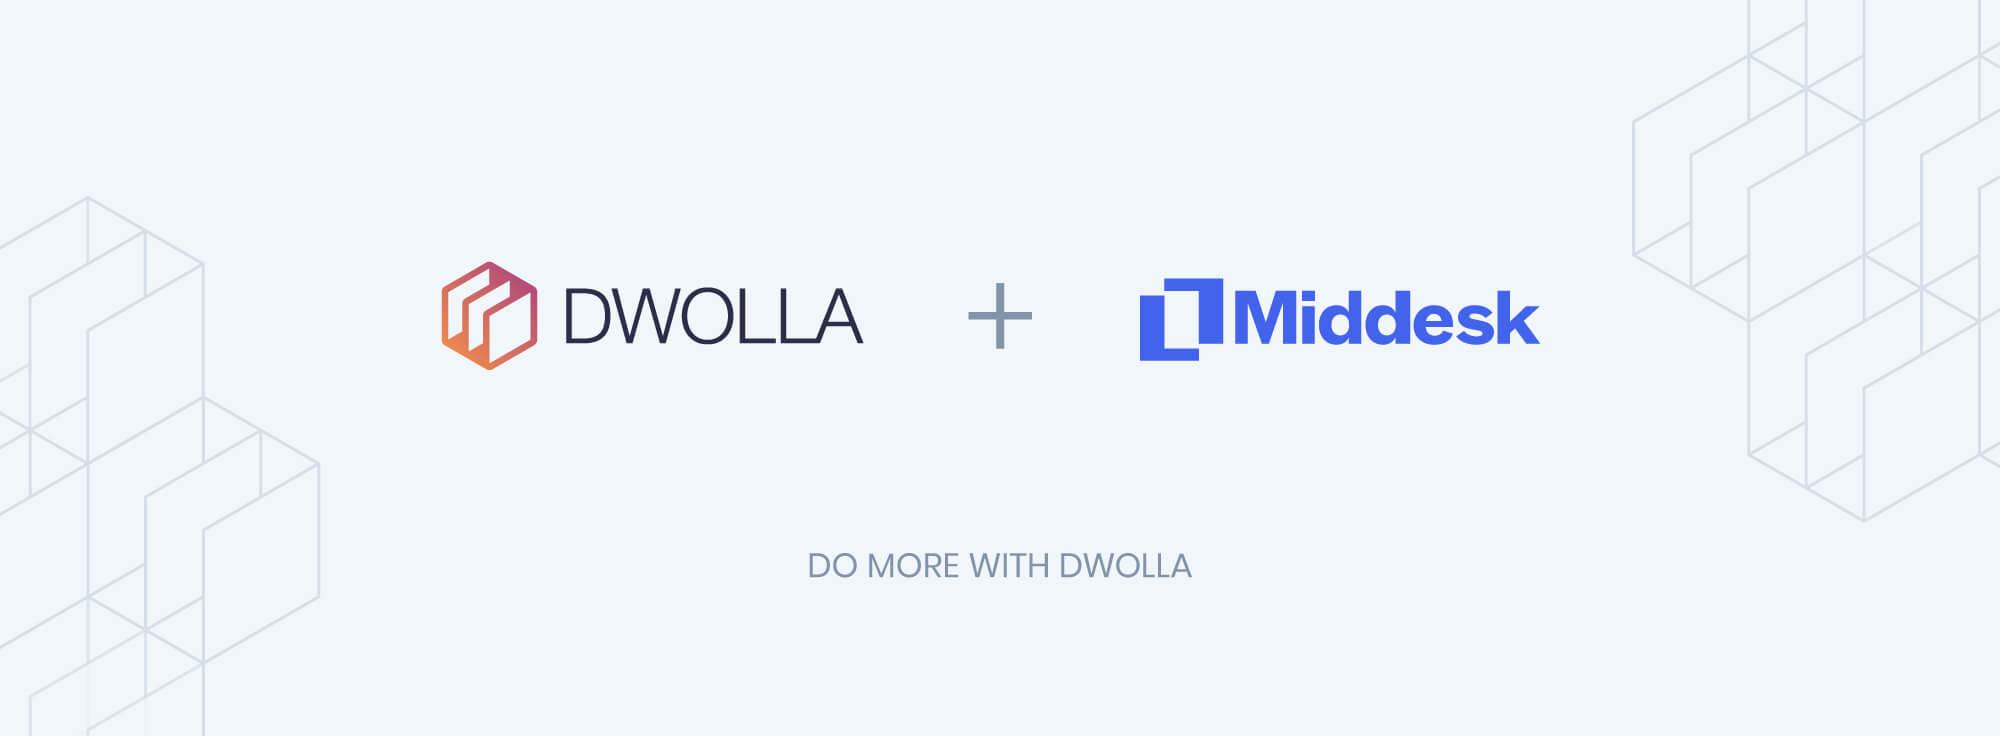 dwolla middesk partnership